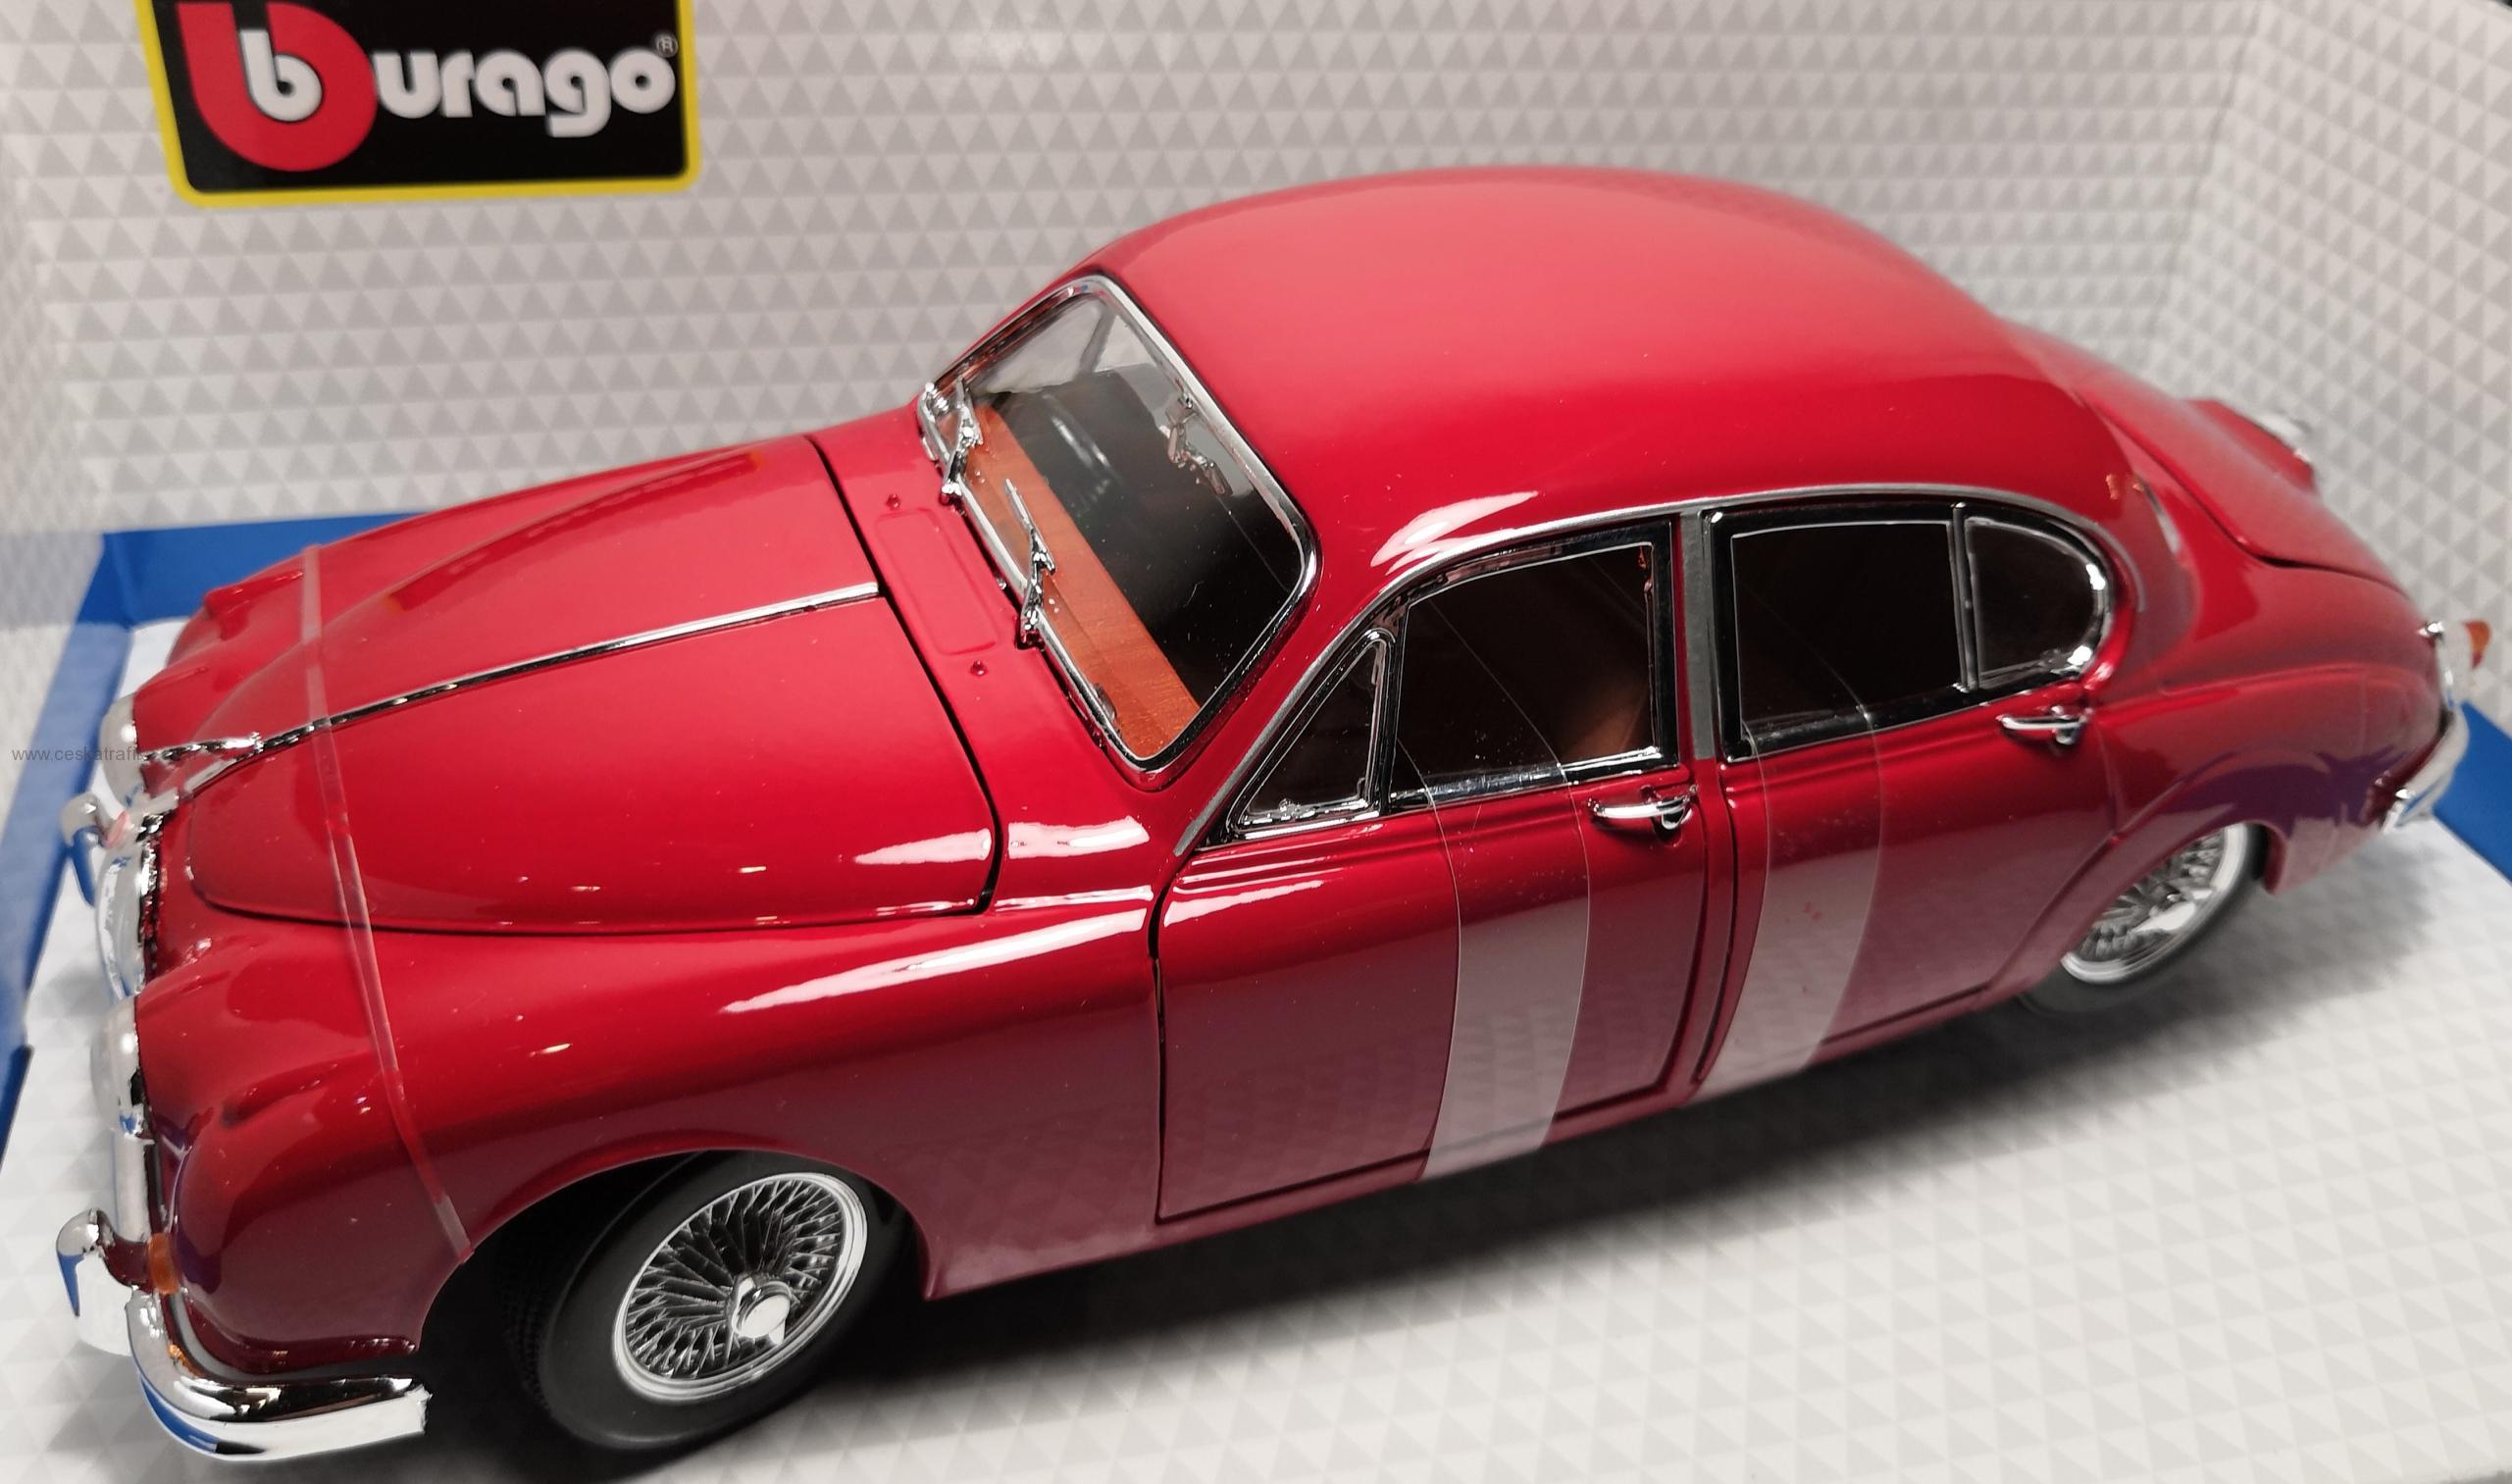 Jaguar Mark II (1959) red Bburago 1:18